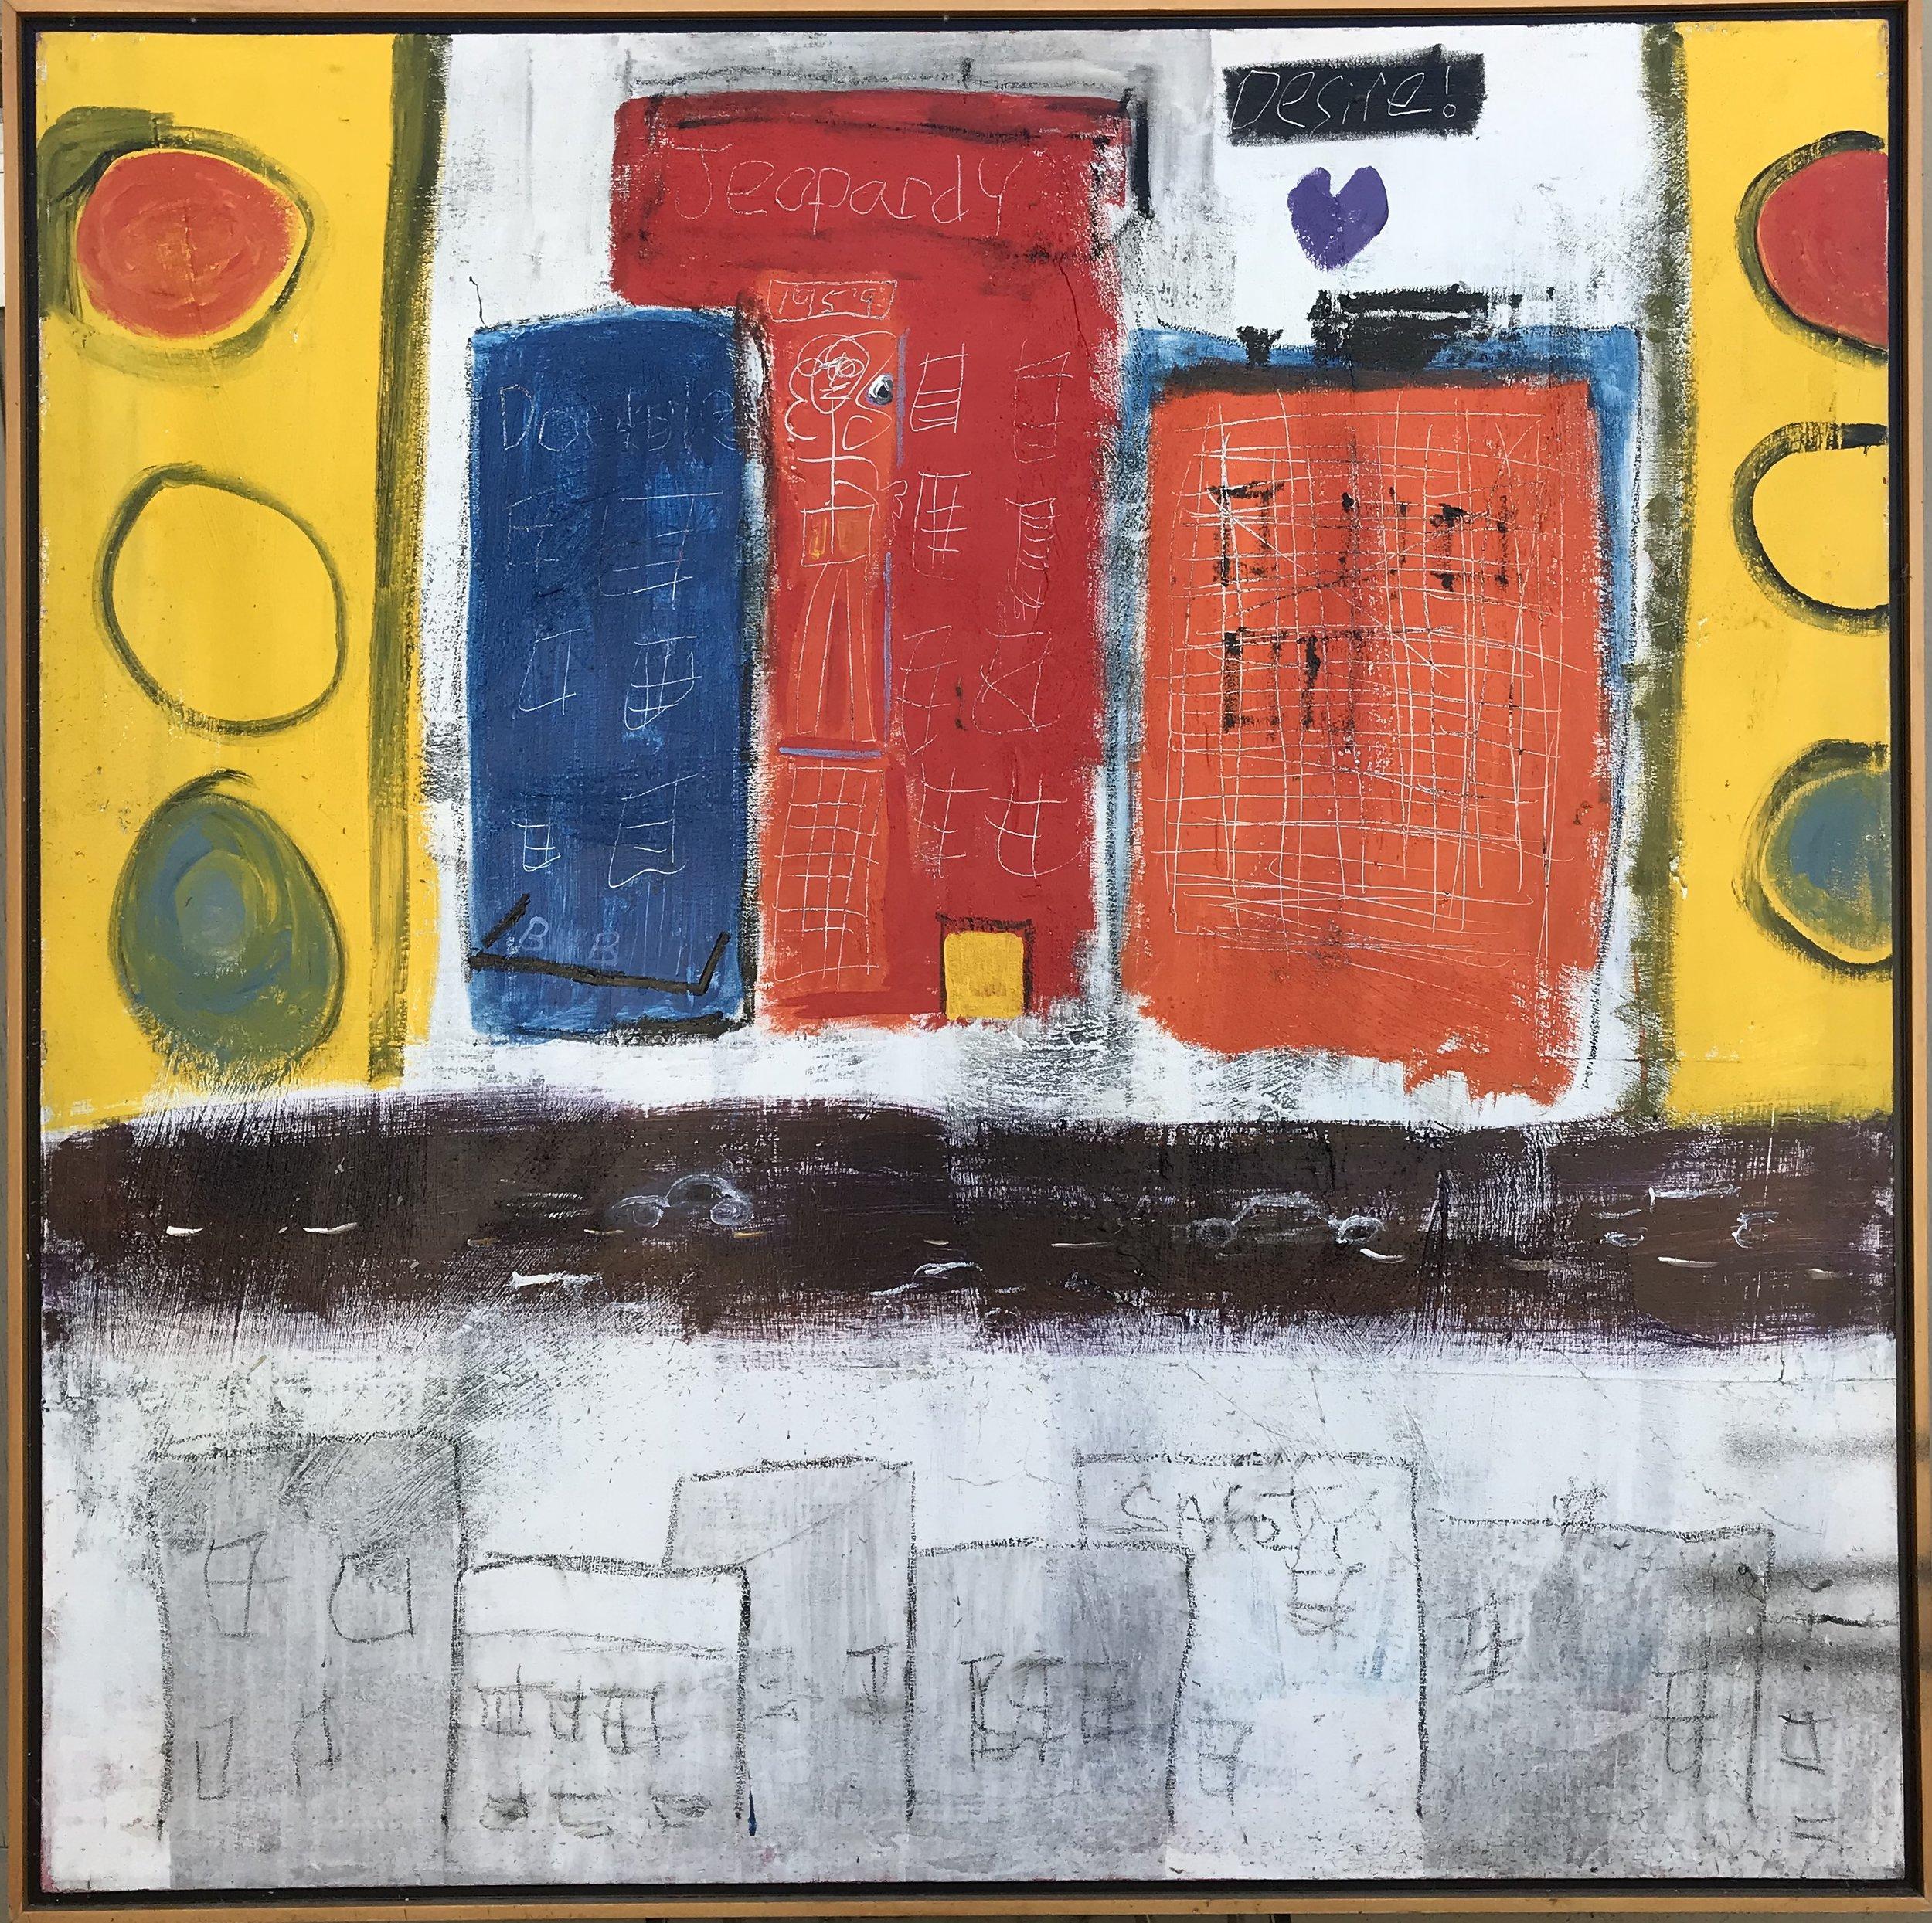 """Traffic Lights"" - 48"" x 48"", oil on canvas framed in 2 1/2"" floater frameValue: $7,000Opening bid: $2,800email your bid to: art@bradfordbrenner.com"